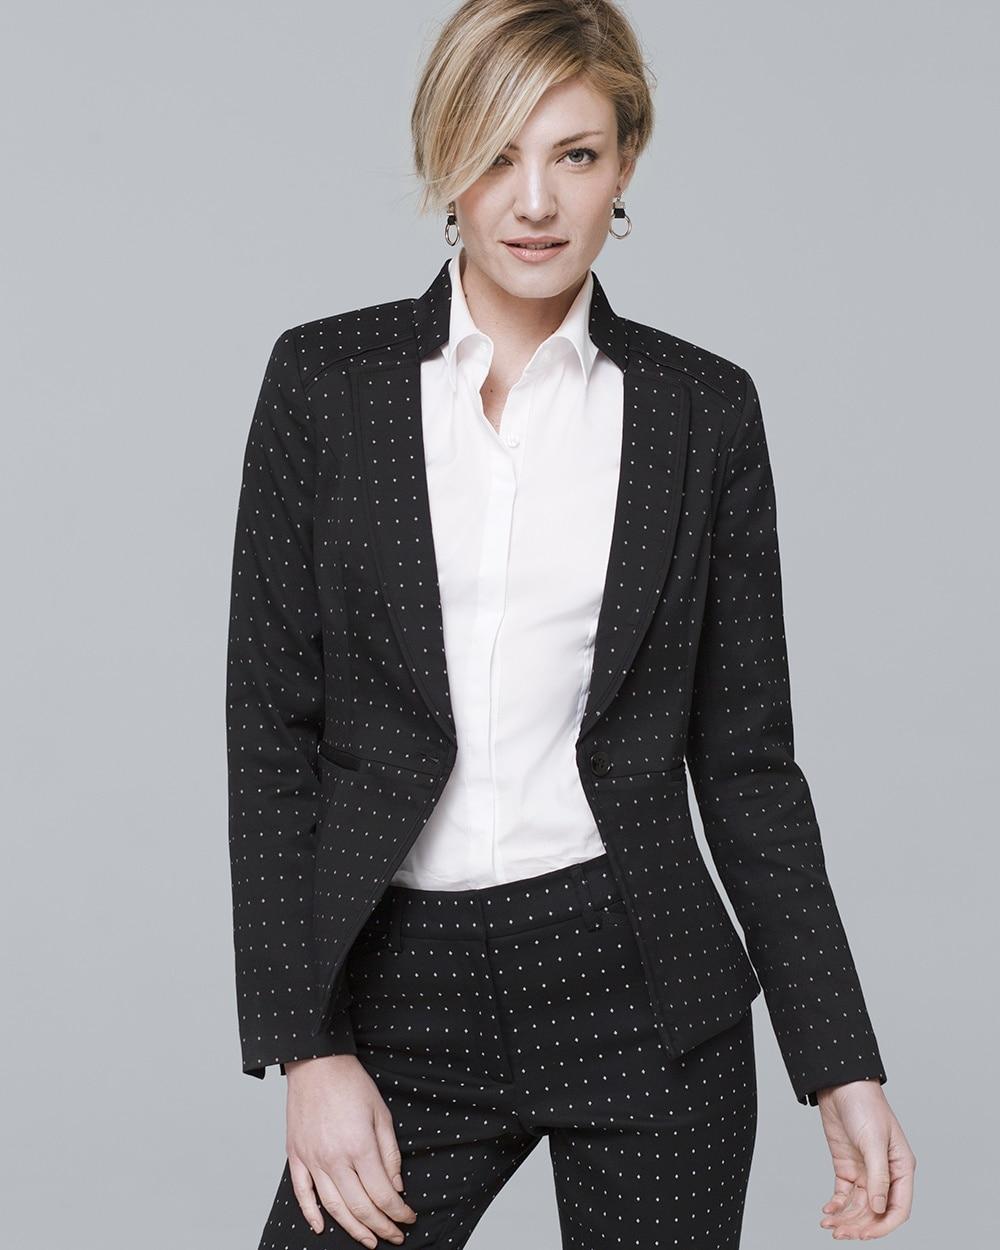 0c2f7db850 Diamond Dot Blazer Jacket - Shop Jackets For Women - Blazers, Vests,  Trenches & More - White House Black Market